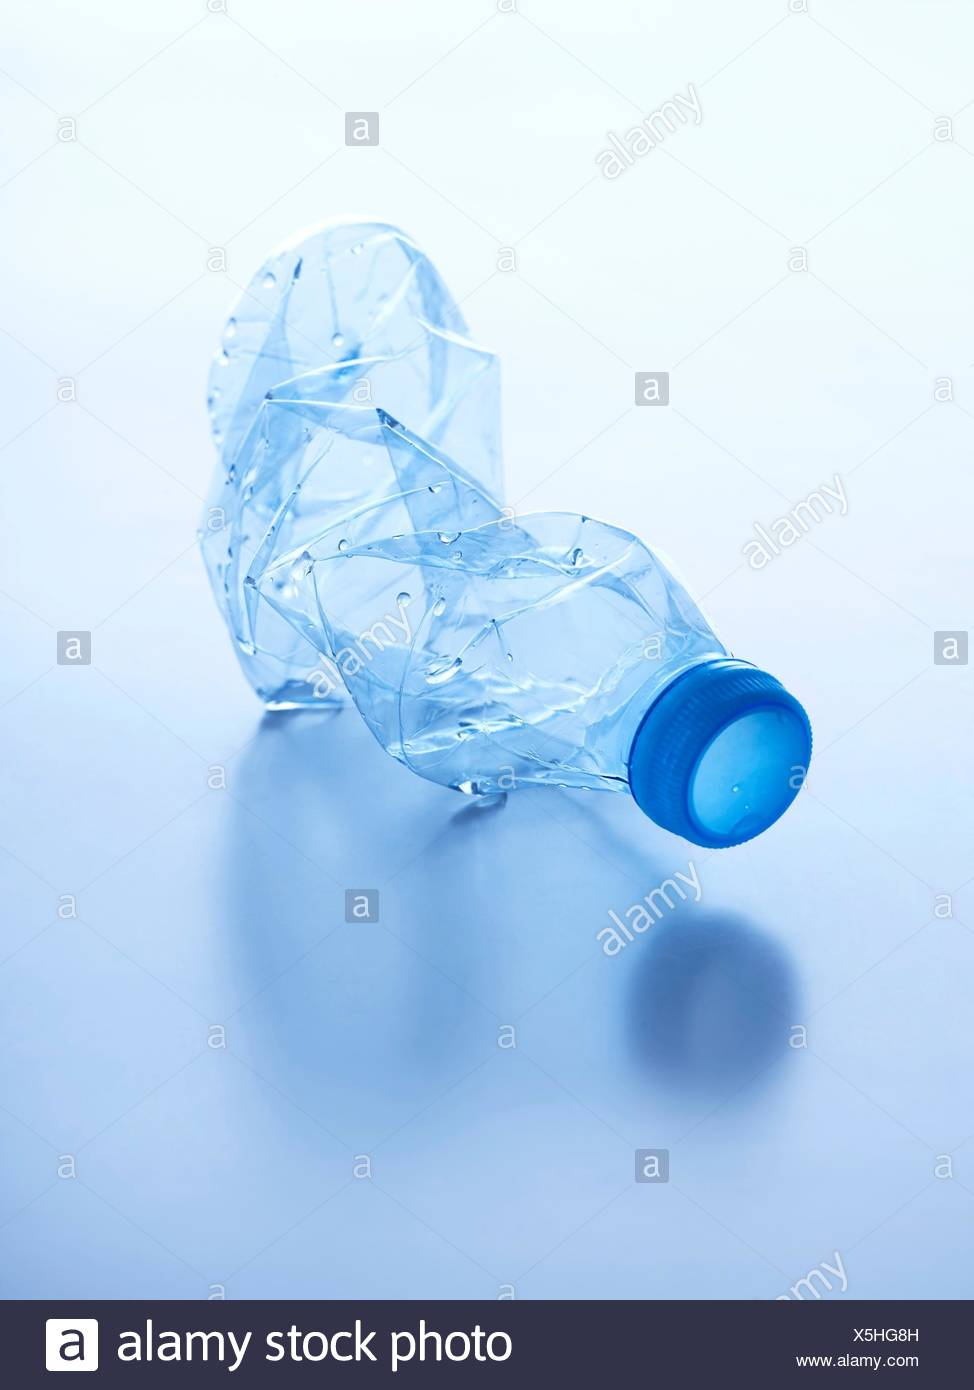 Crushed plastic bottle, studio shot. - Stock Image